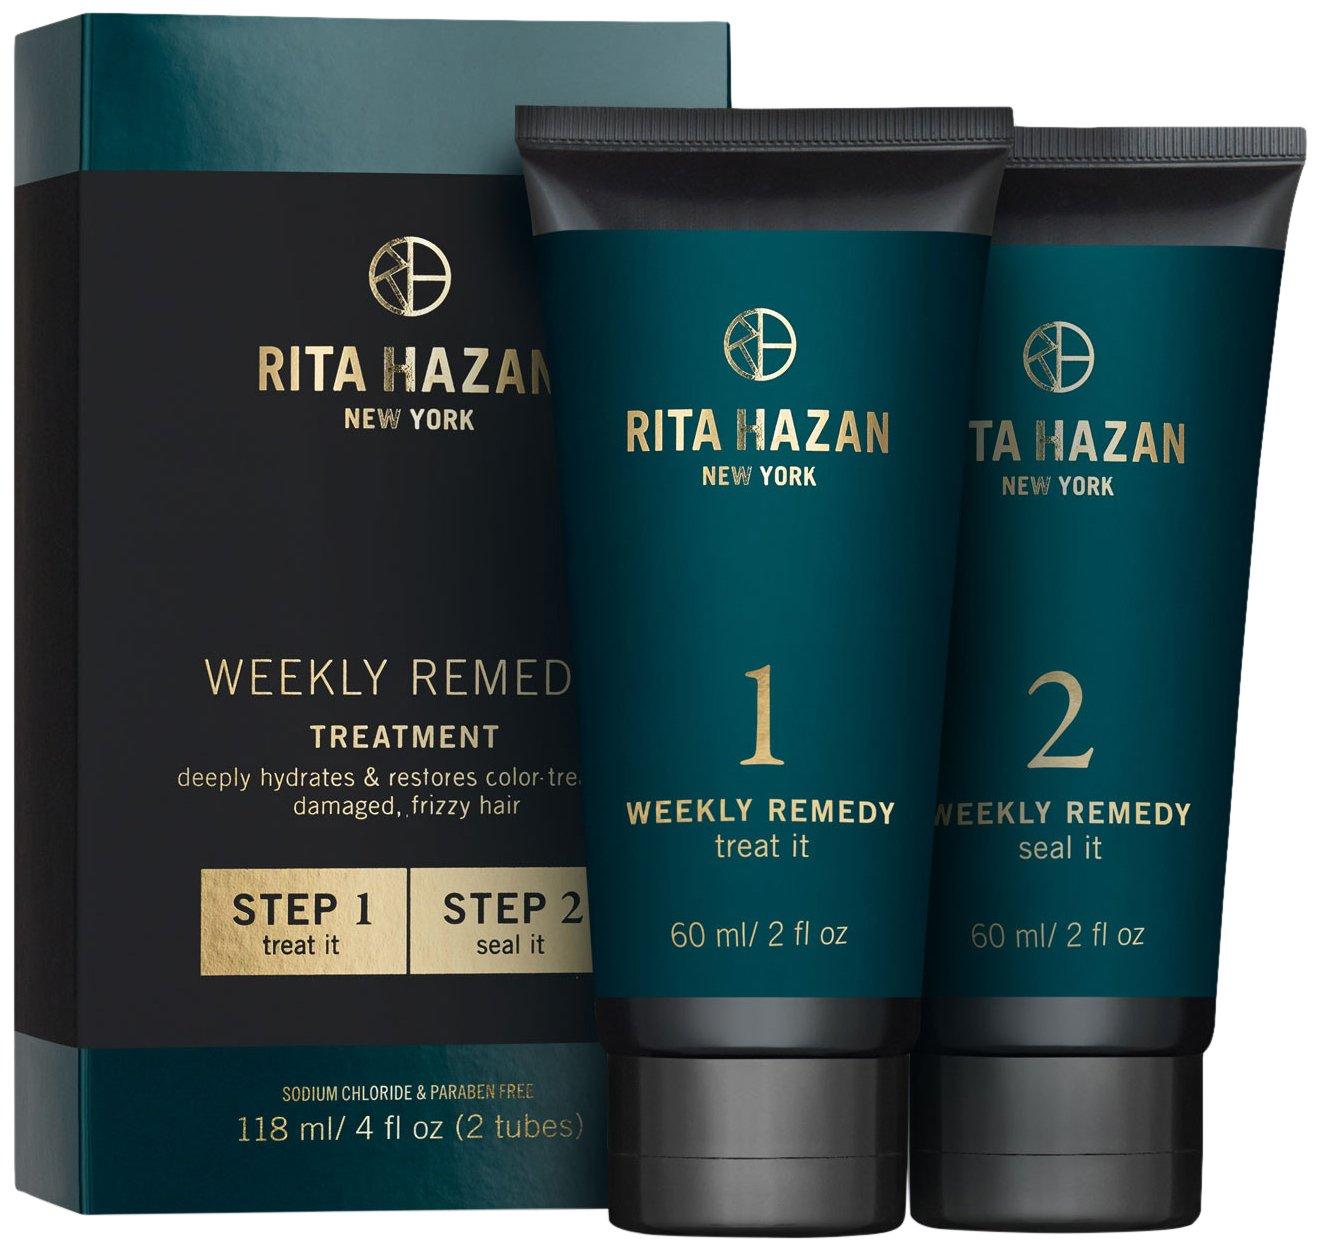 Rita Hazan- Two Step Deeply Hydrating and Restorative Weekly Remedy Cream Kit